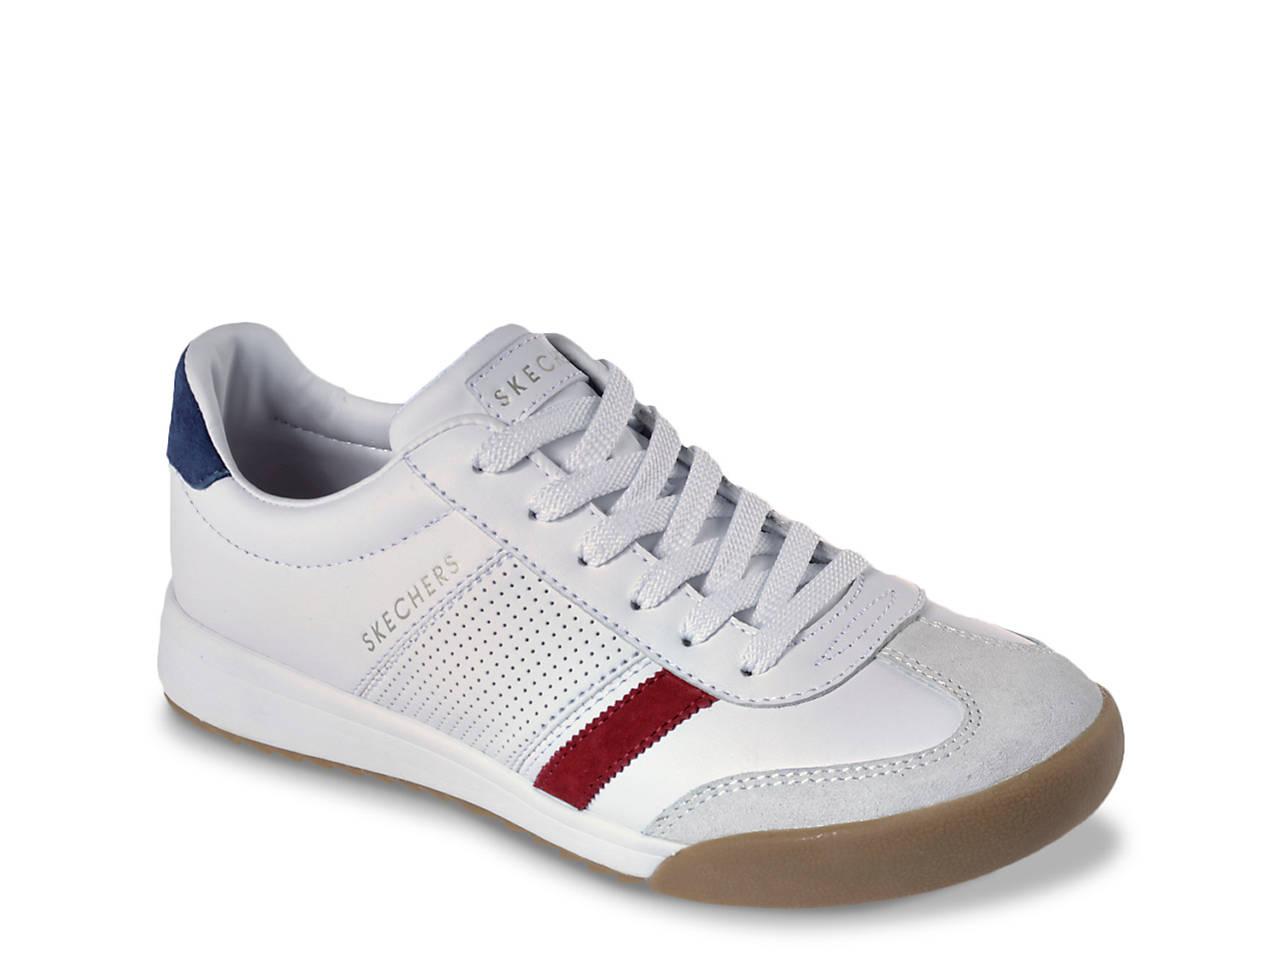 5f1b0b69c109 Zinger 2.0 Sneaker